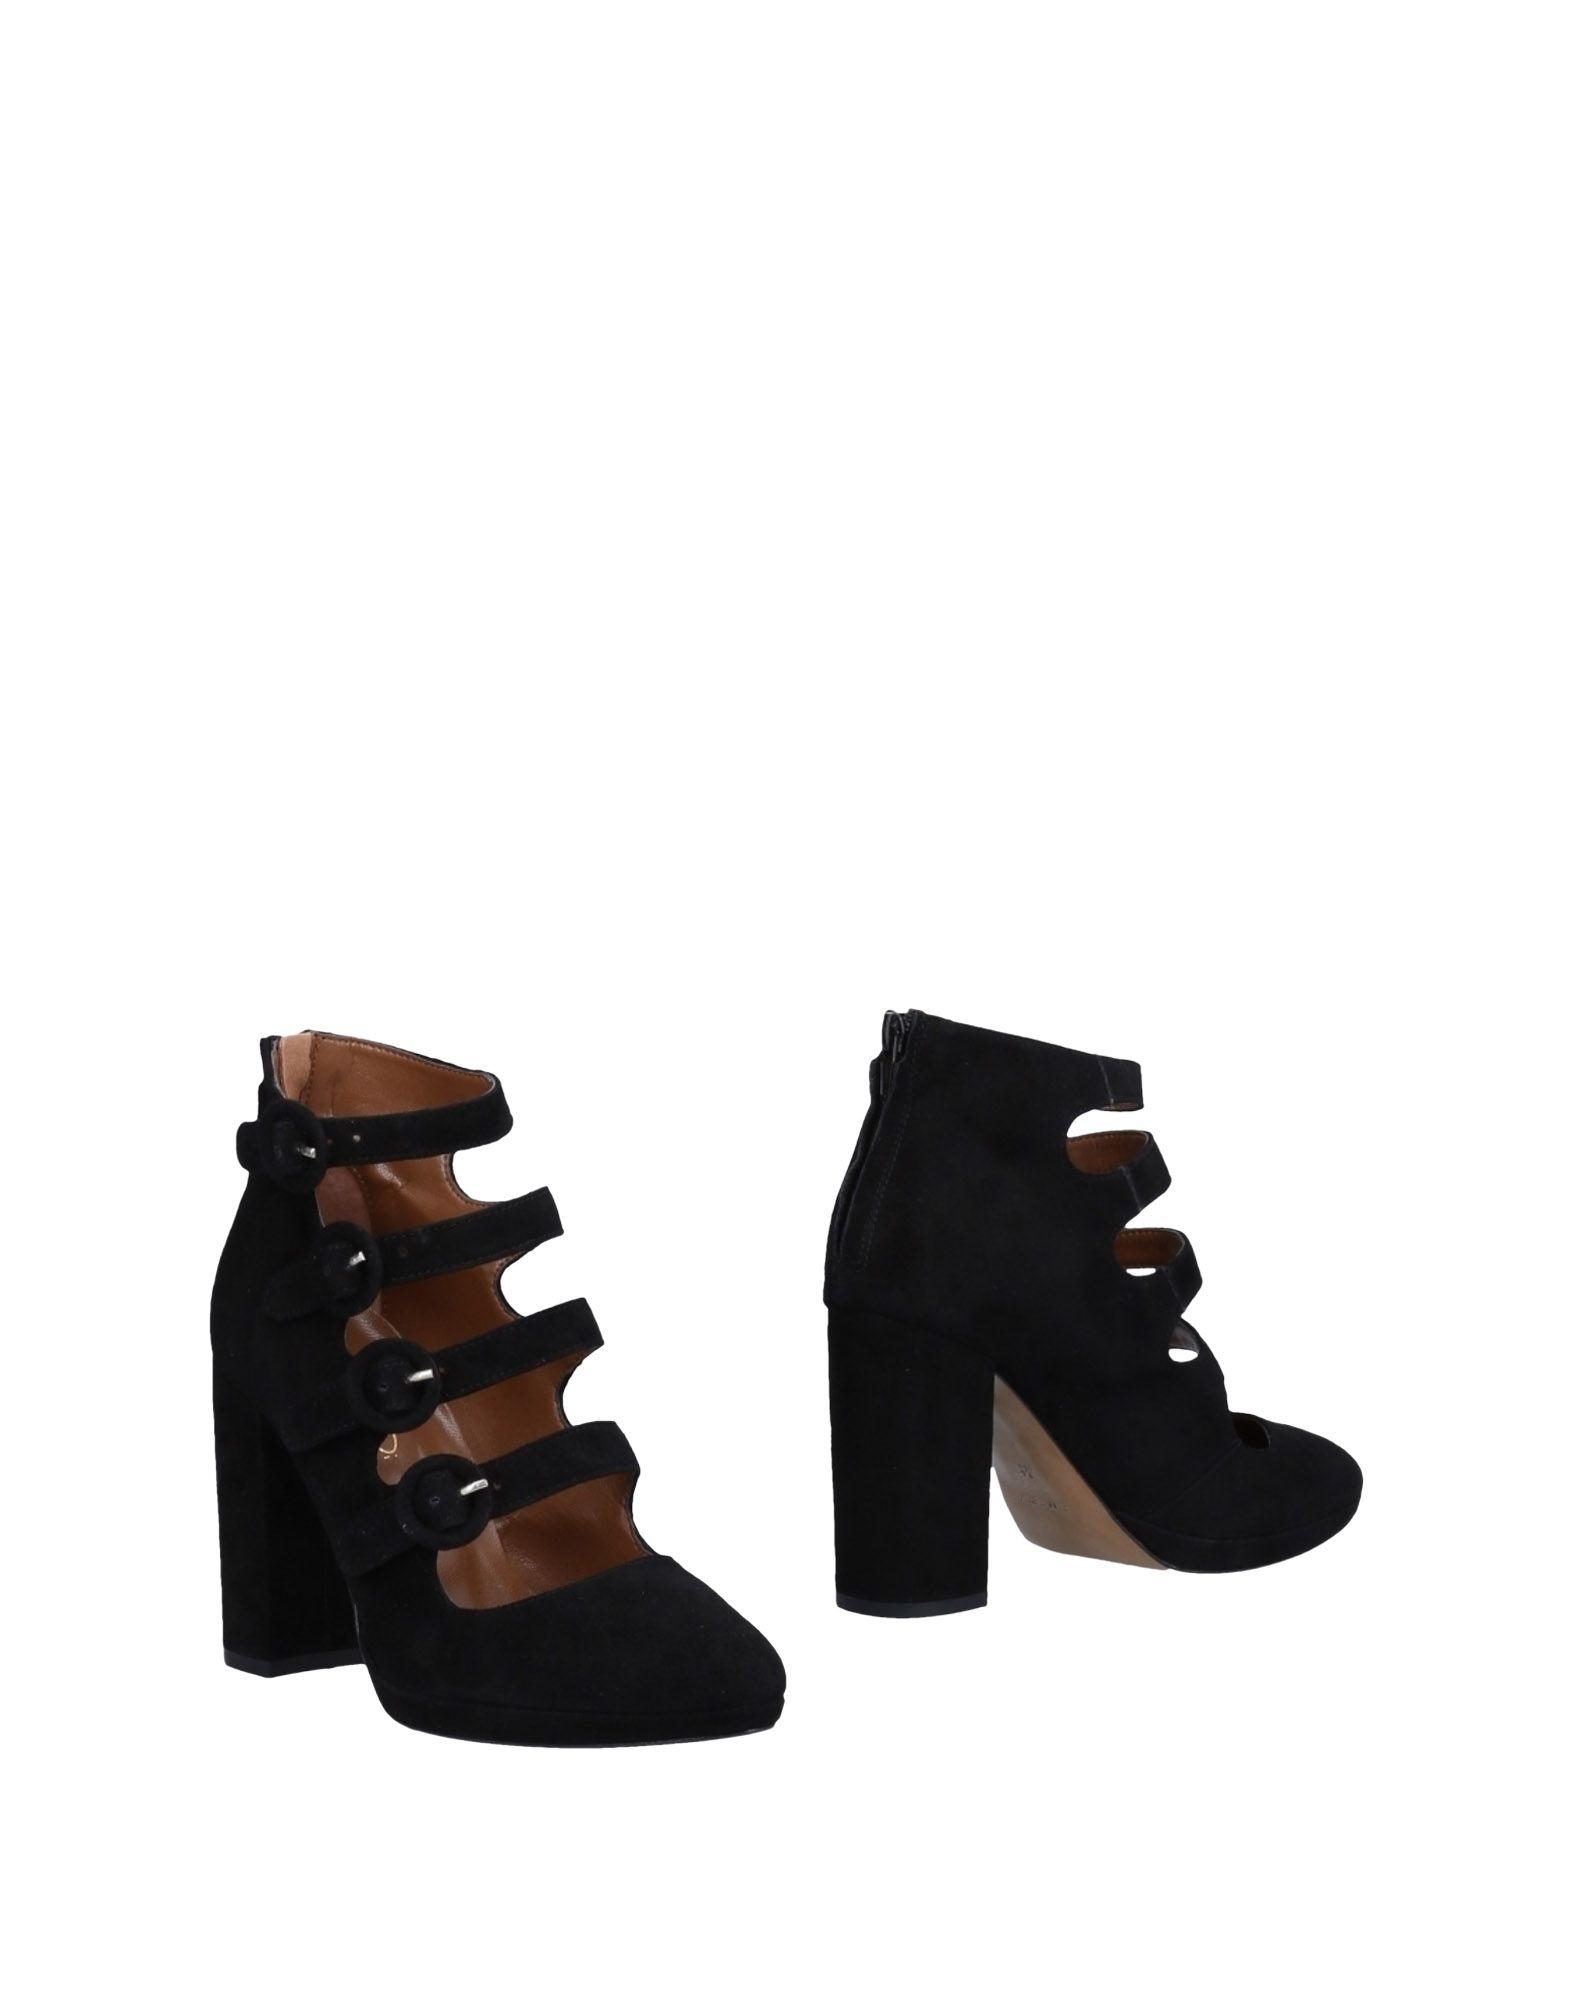 Bianca Di Stiefelette Damen  11494350MX Gute Qualität beliebte Schuhe